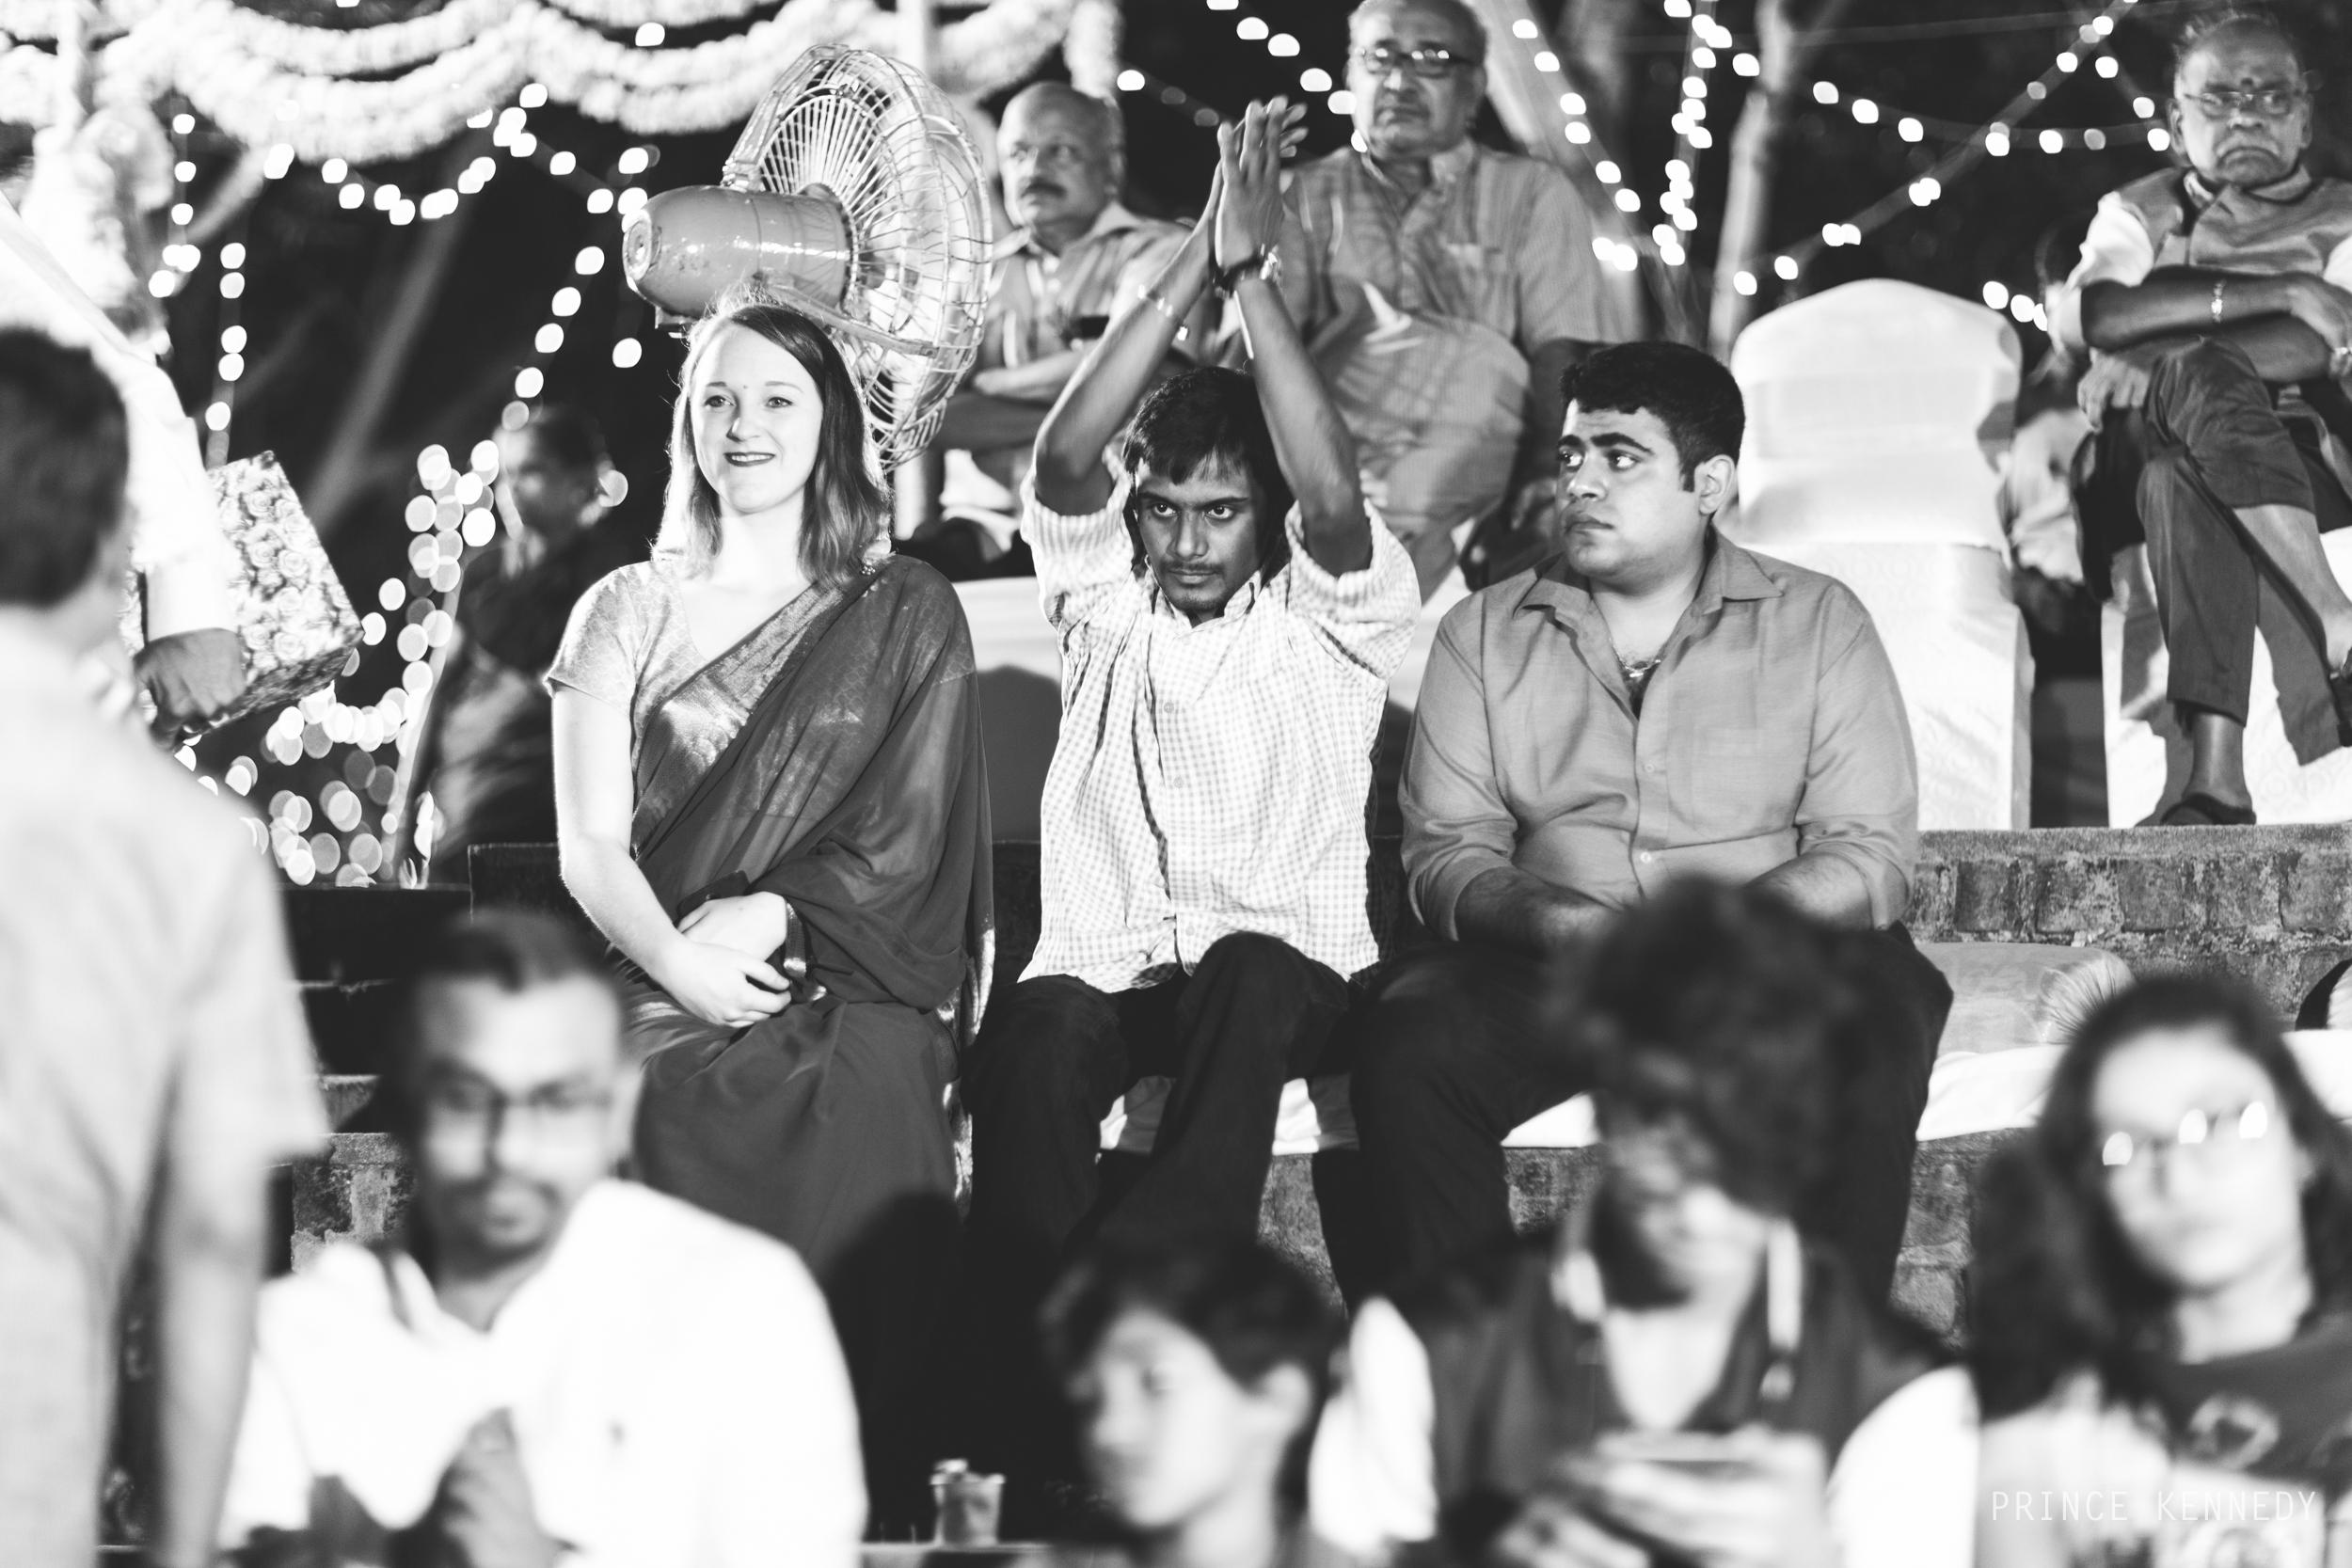 Athmajja-Nithesh-Engagement-Couple-Portrait-Portraiture-Wedding-Couple-Portrait-Chennai-Photographer-Candid-Photography-Destination-Best-Prince-Kennedy-Photography-150.jpg